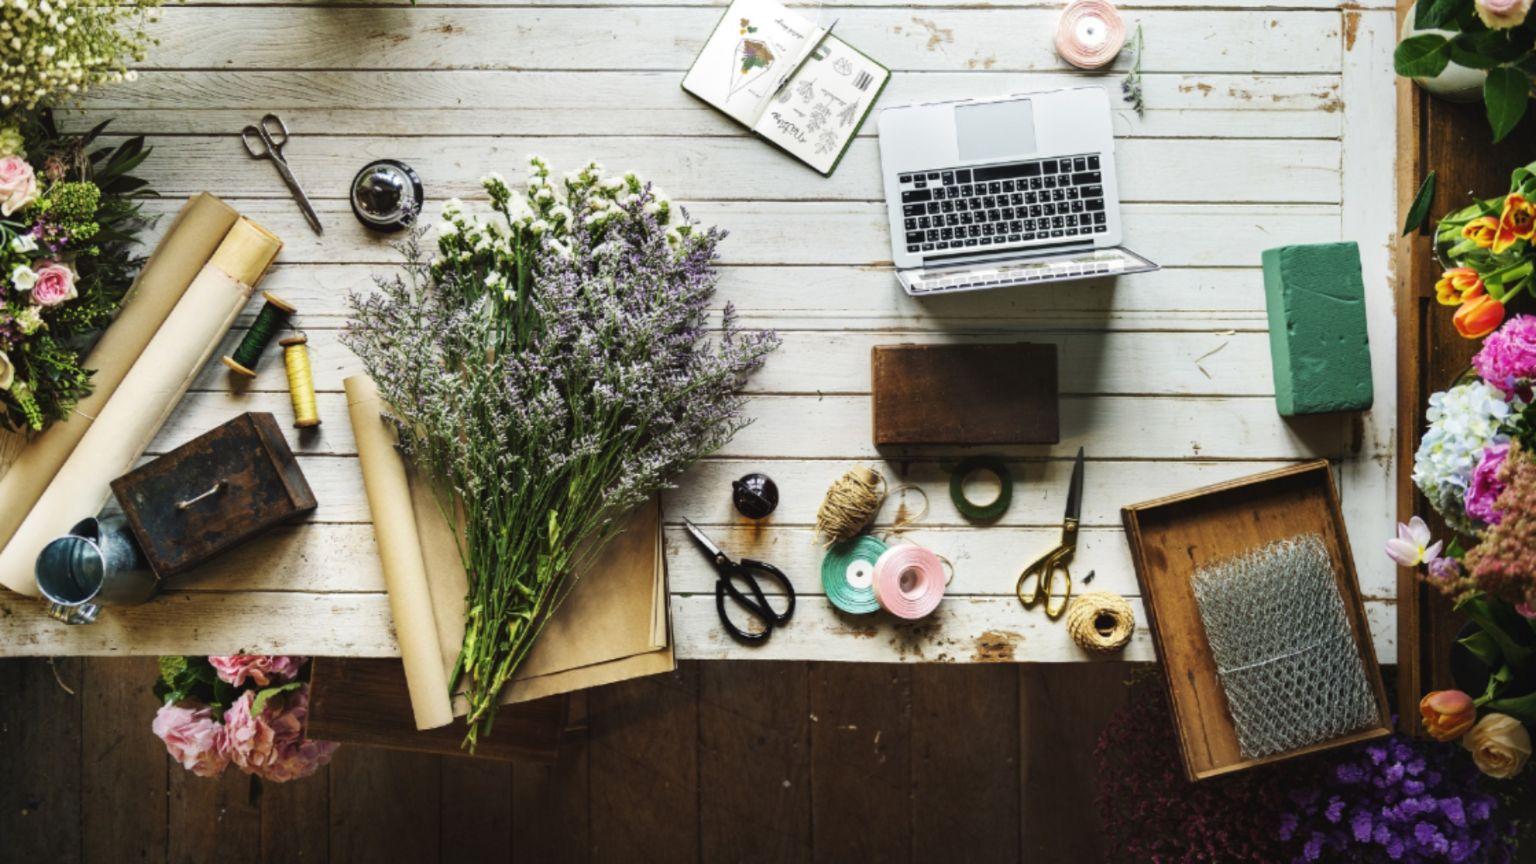 Florist Shop With Real Estate